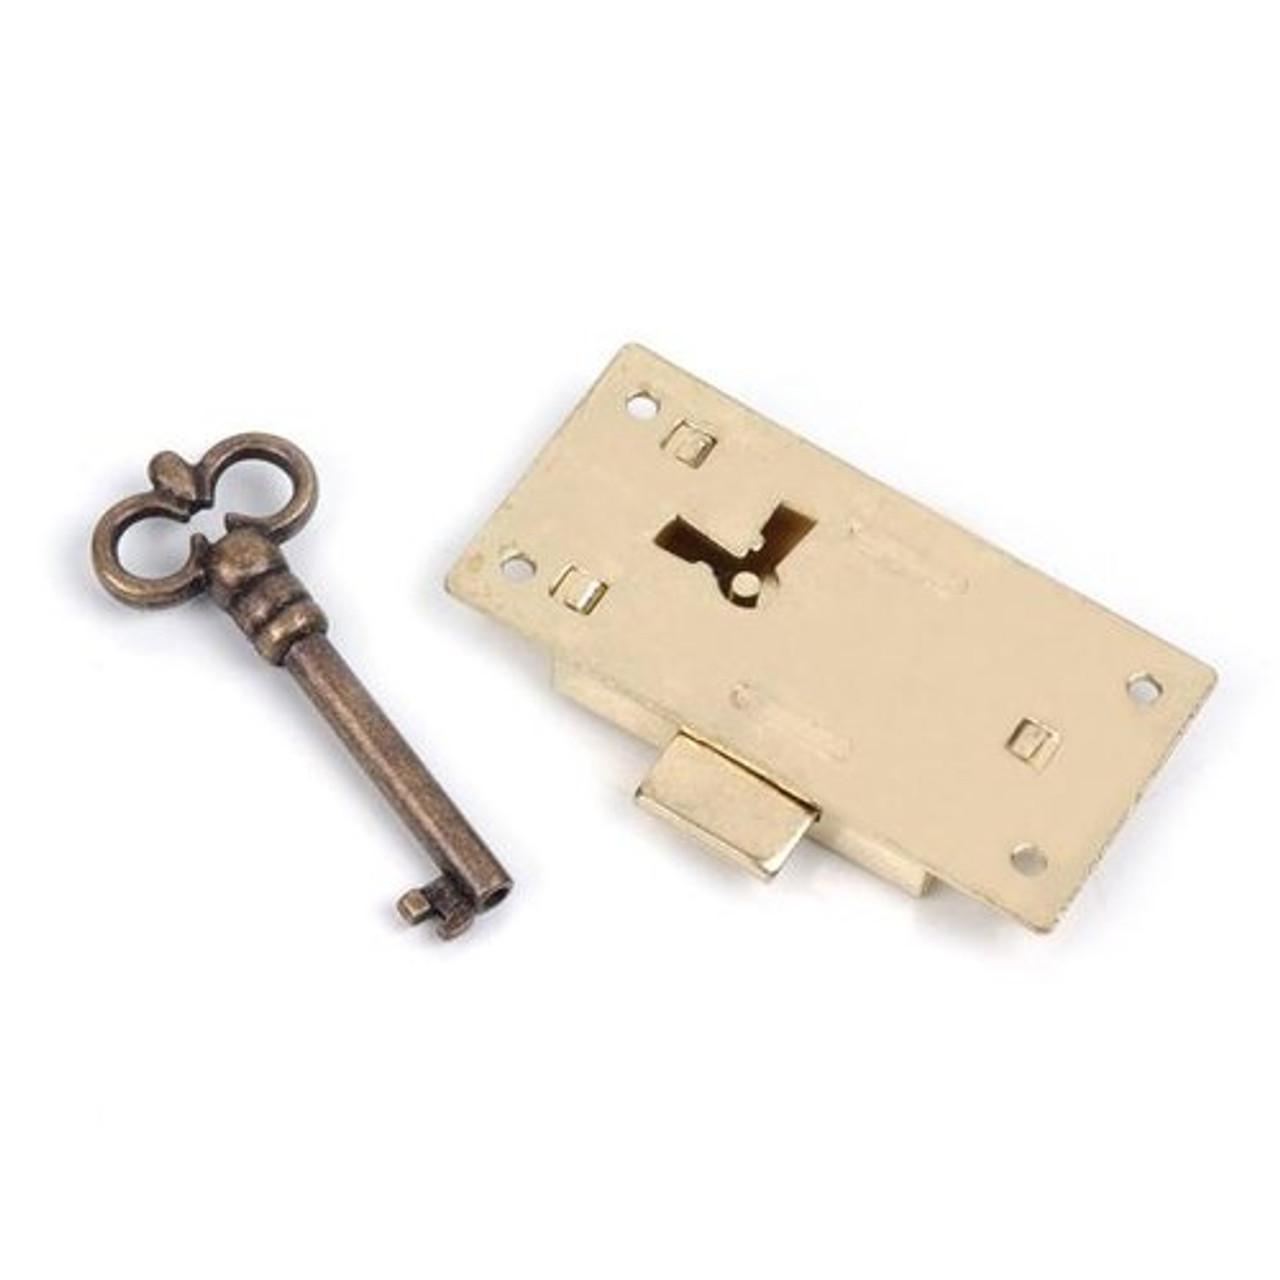 Brass Lock And Extra Key 02026305